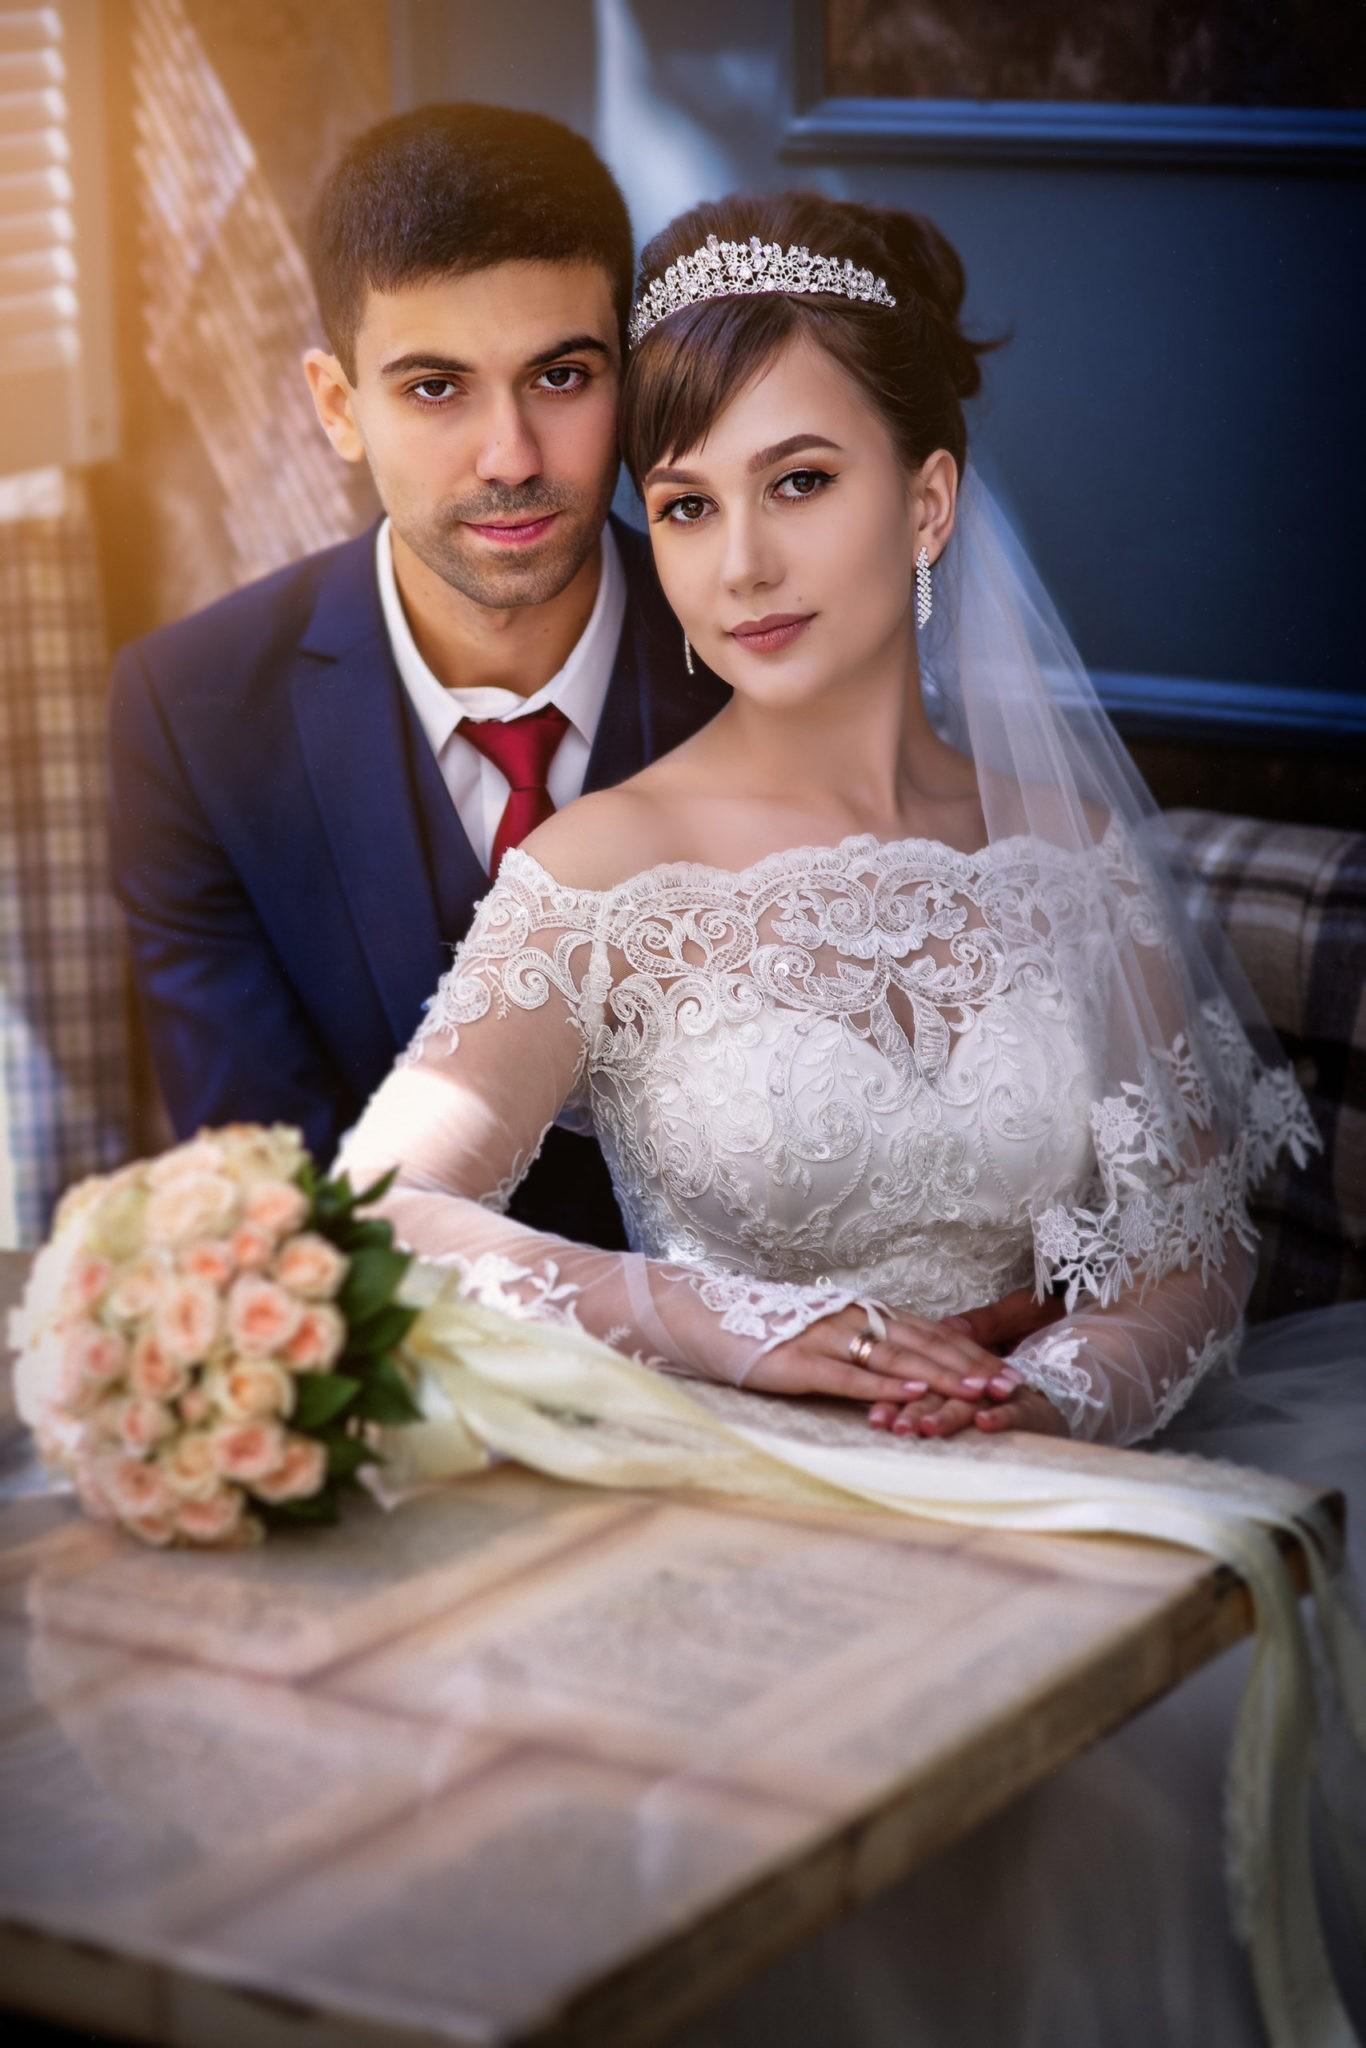 Свадебная фотосъемка в ресторане, съемка невесты и жениха от свадебного фотографа